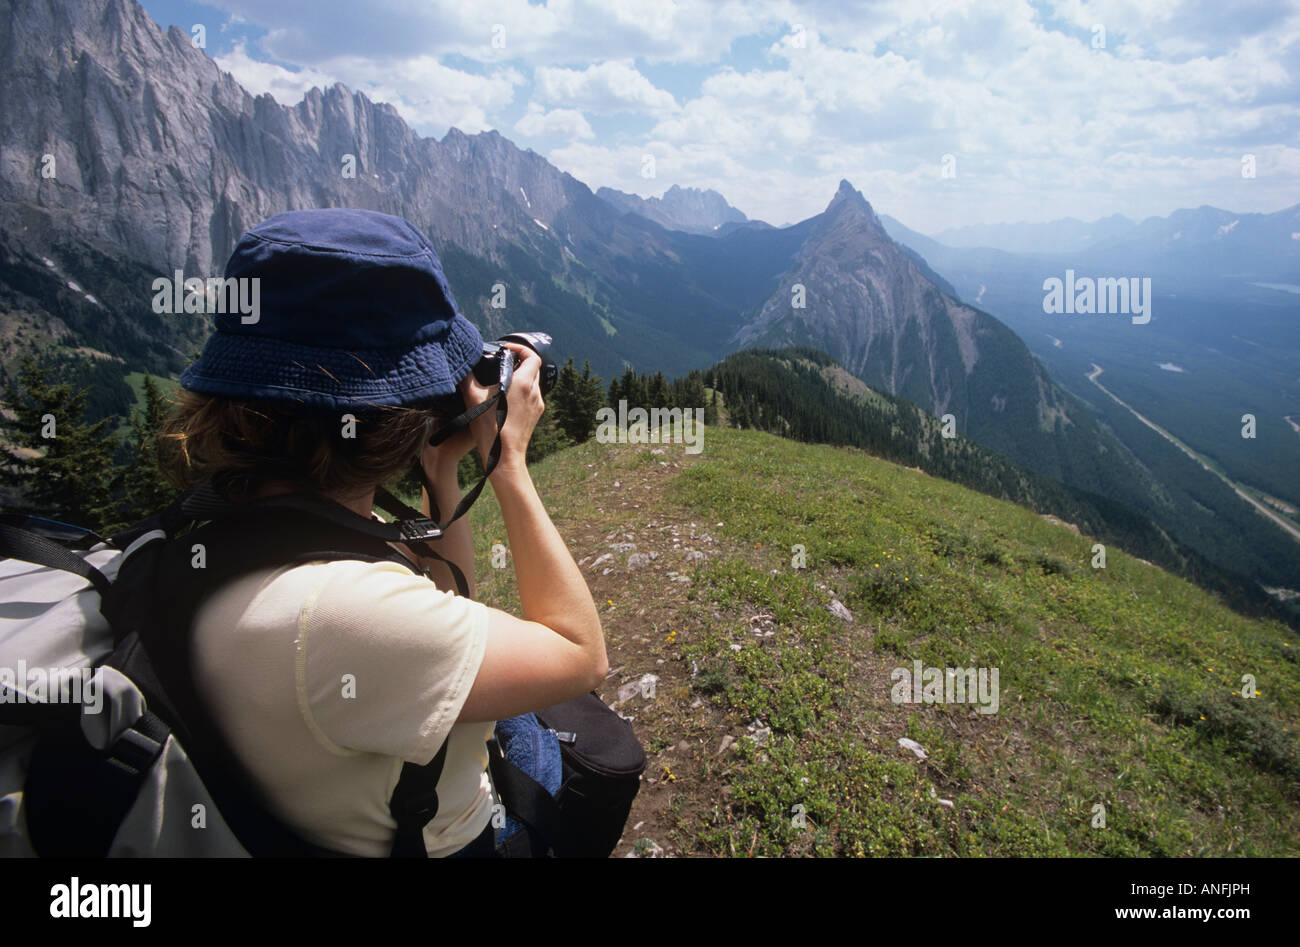 Frau ein Foto Wandern in den kanadischen Rocky Mountains, Alberta, Kanada. Stockbild